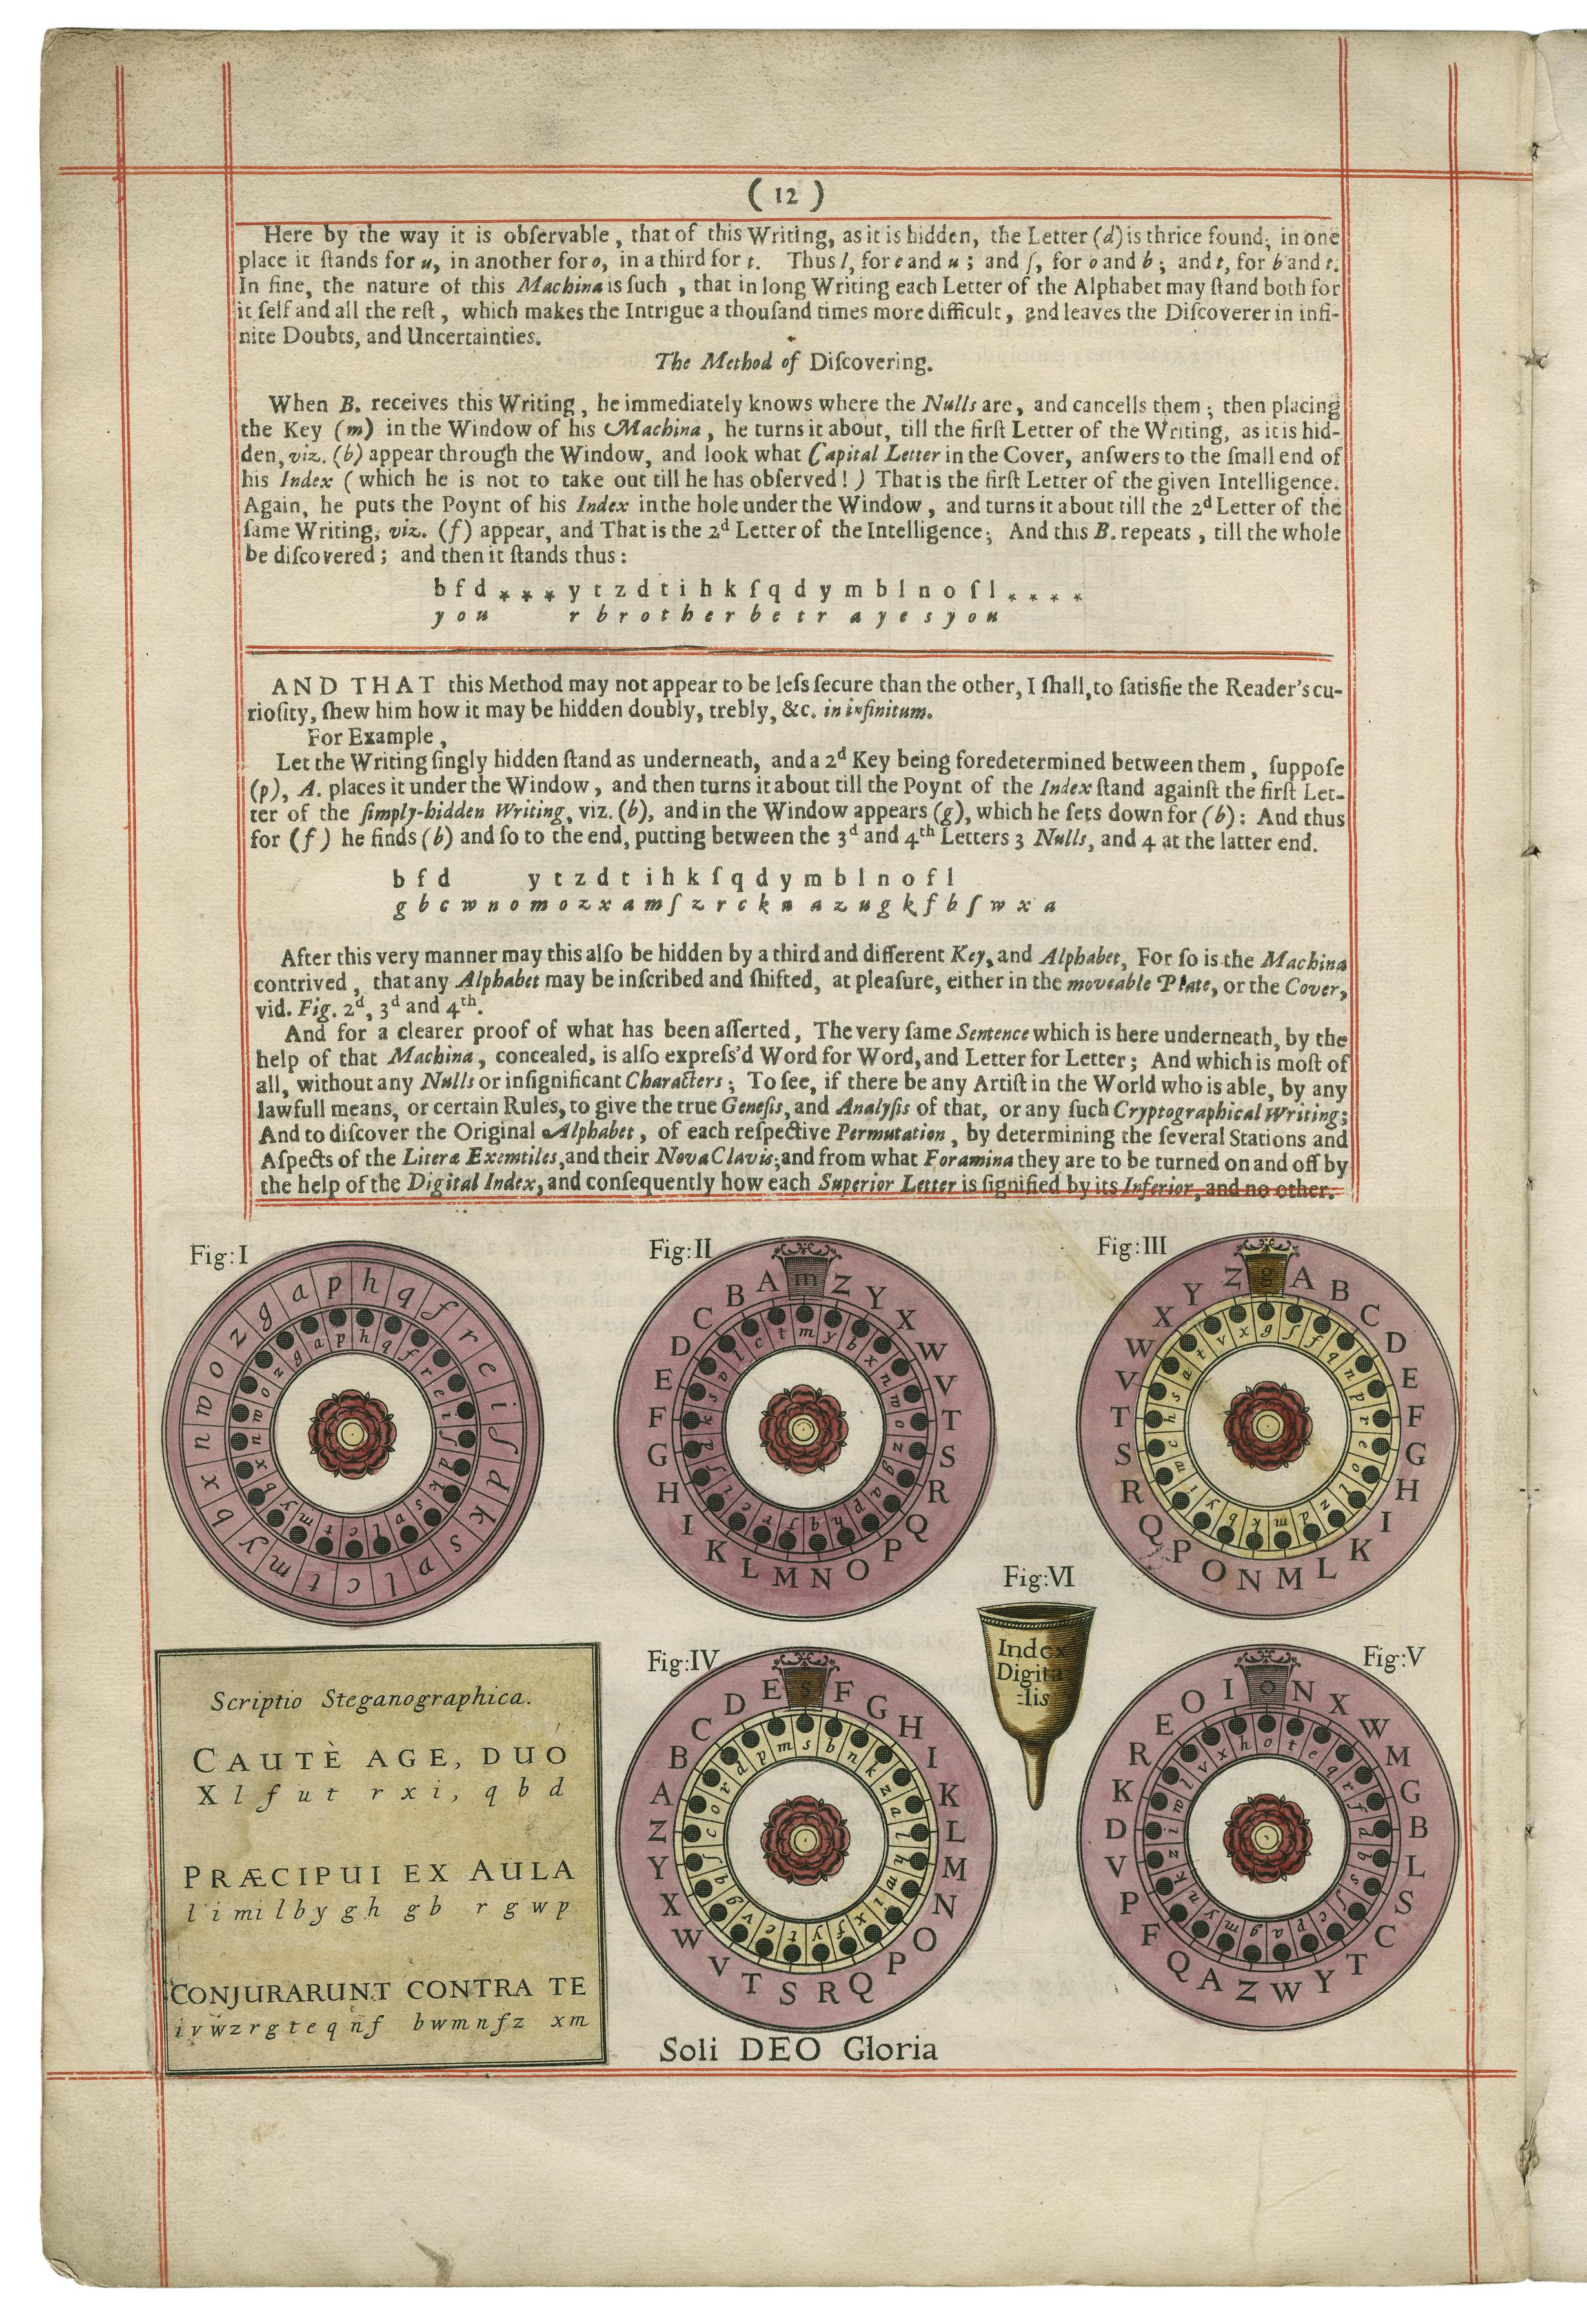 Johannes Trithemius. Polygraphie et universelle escriture caba. Folger Shakespeare Library.